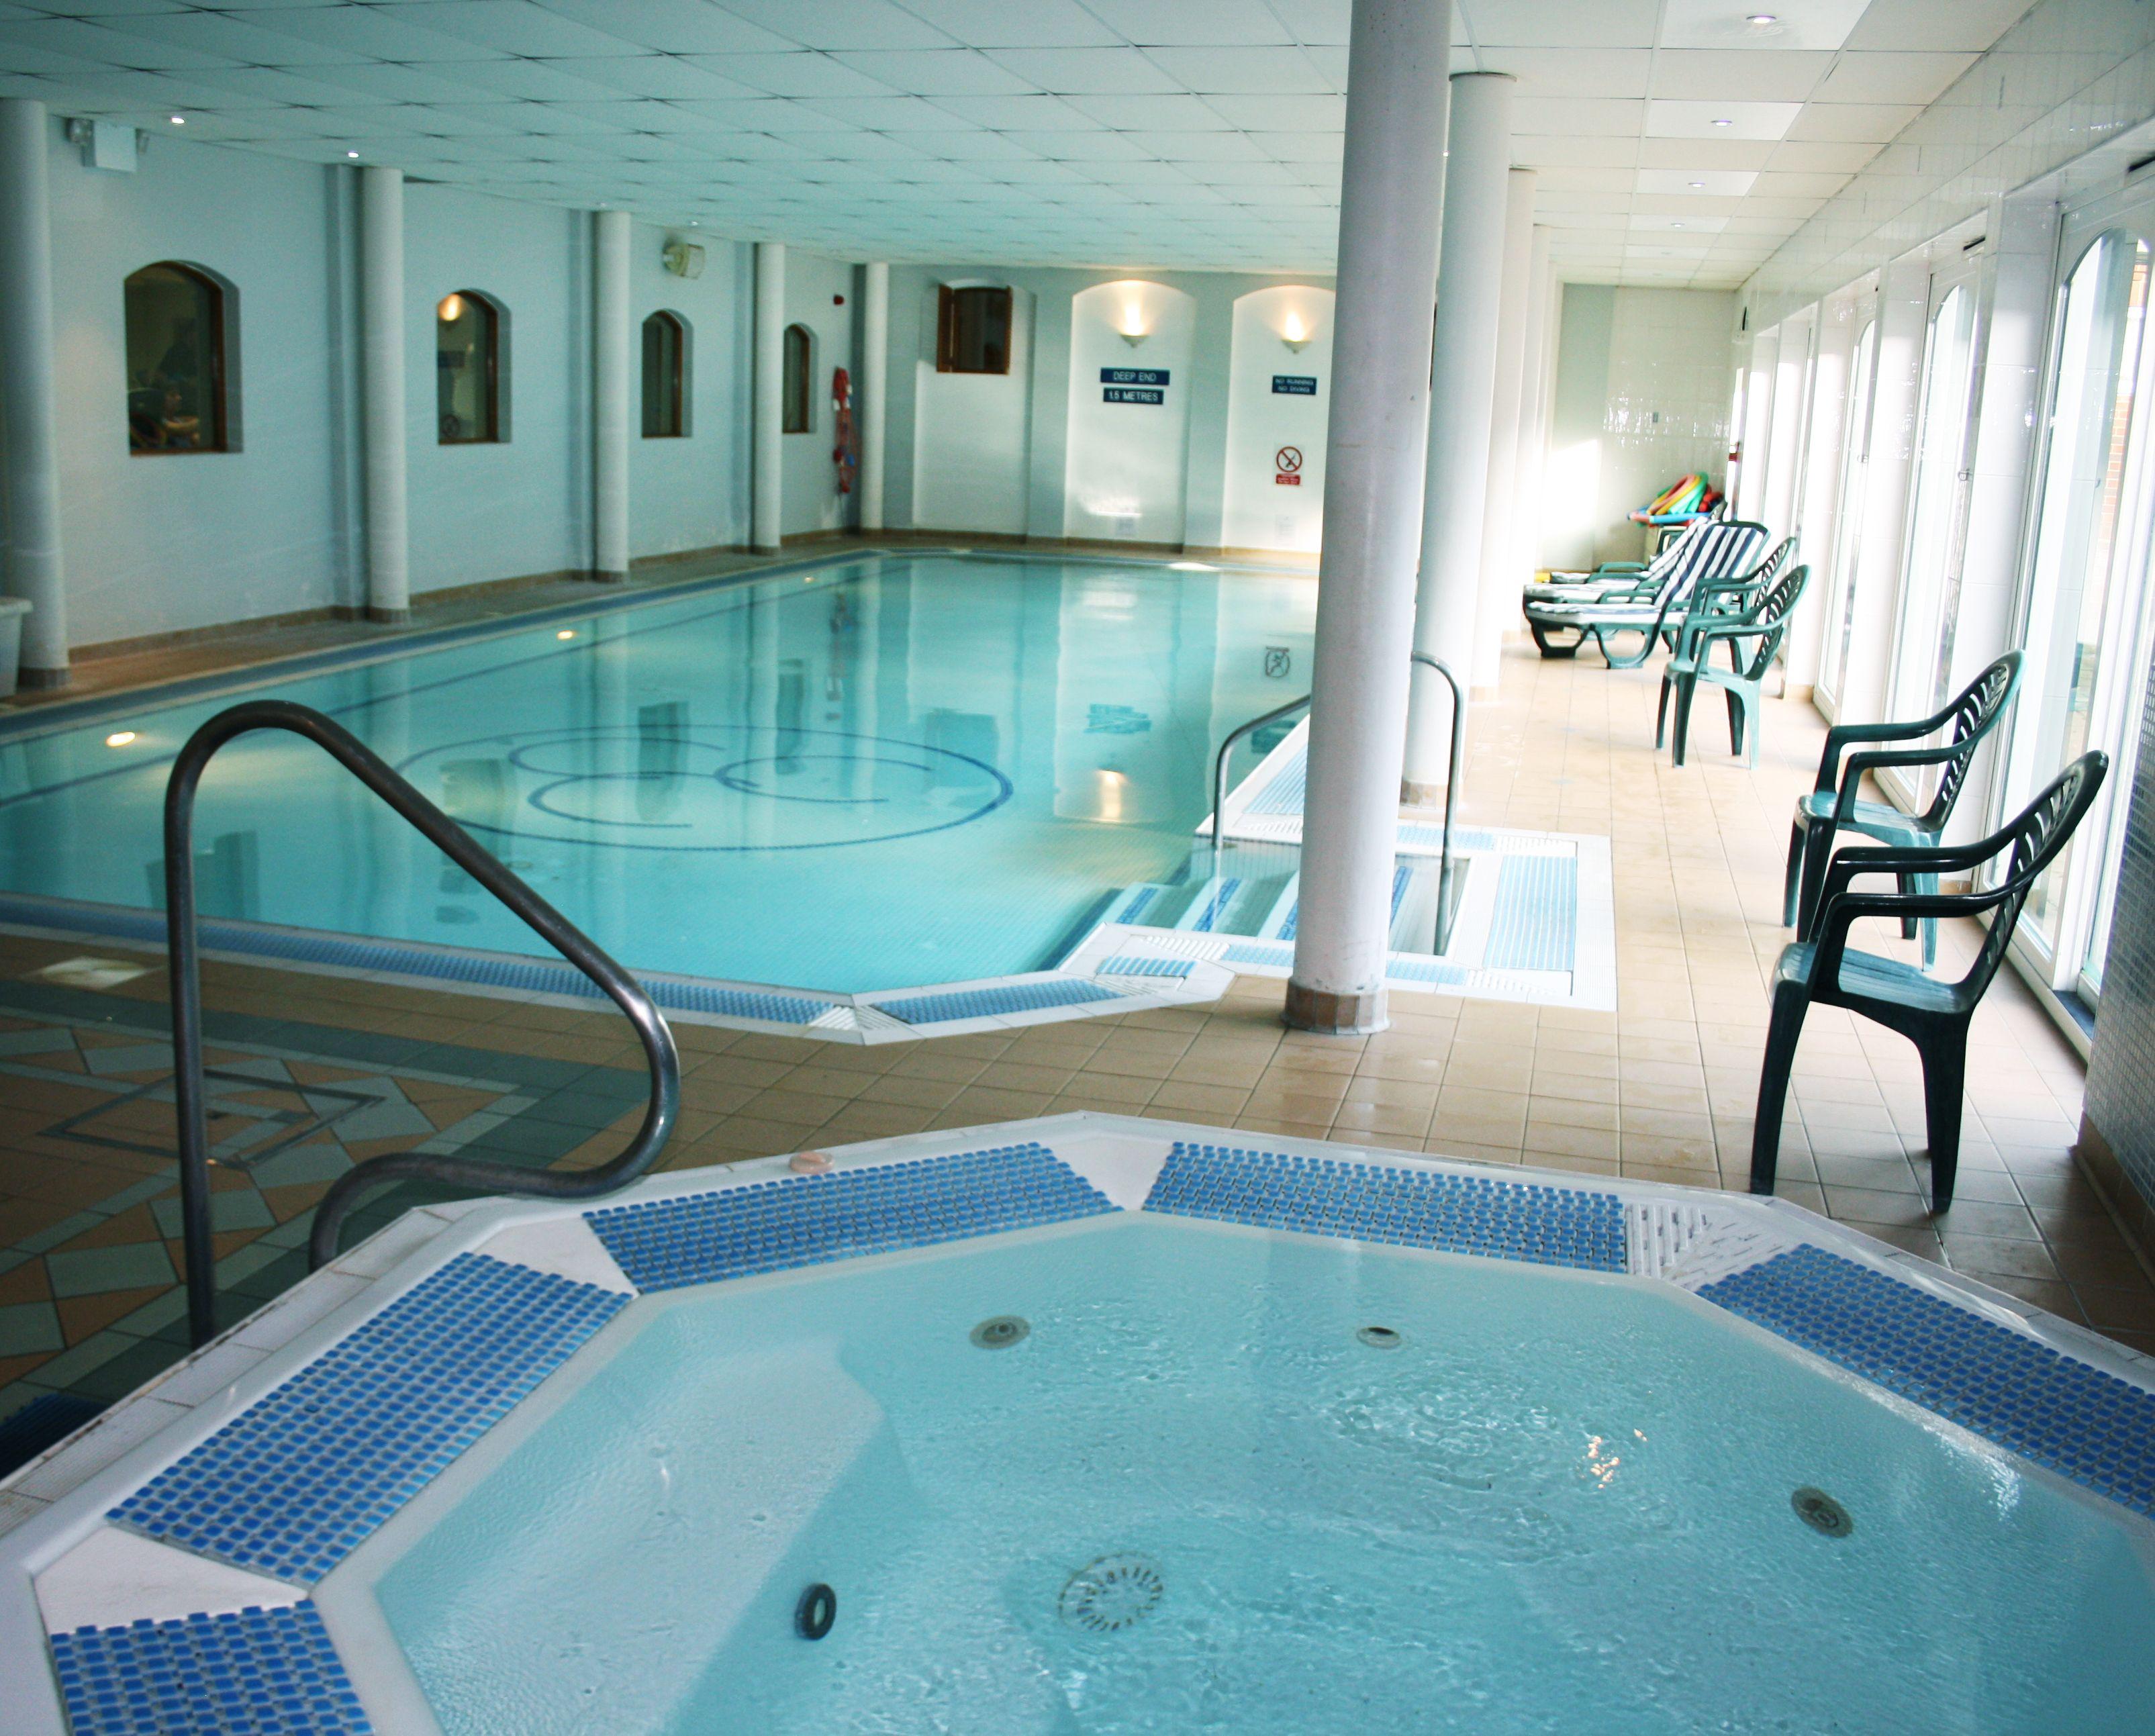 pool & hot tub. www.cottesmoregolf.co.uk | Cottesmore Hotel Golf ...